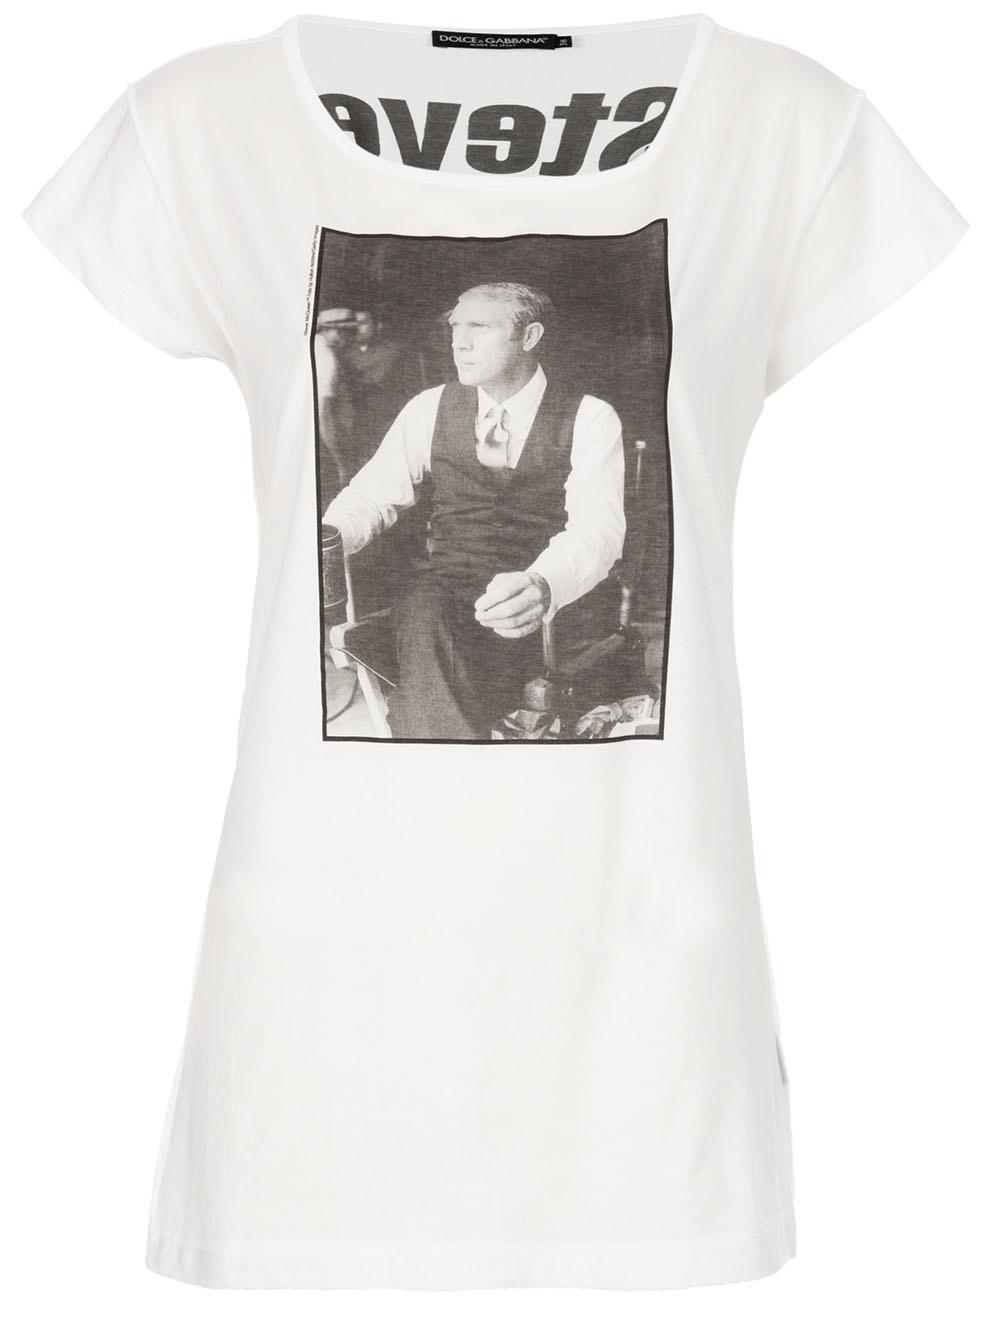 Dolce gabbana printed t shirt in white lyst for Dolce and gabbana printed t shirts